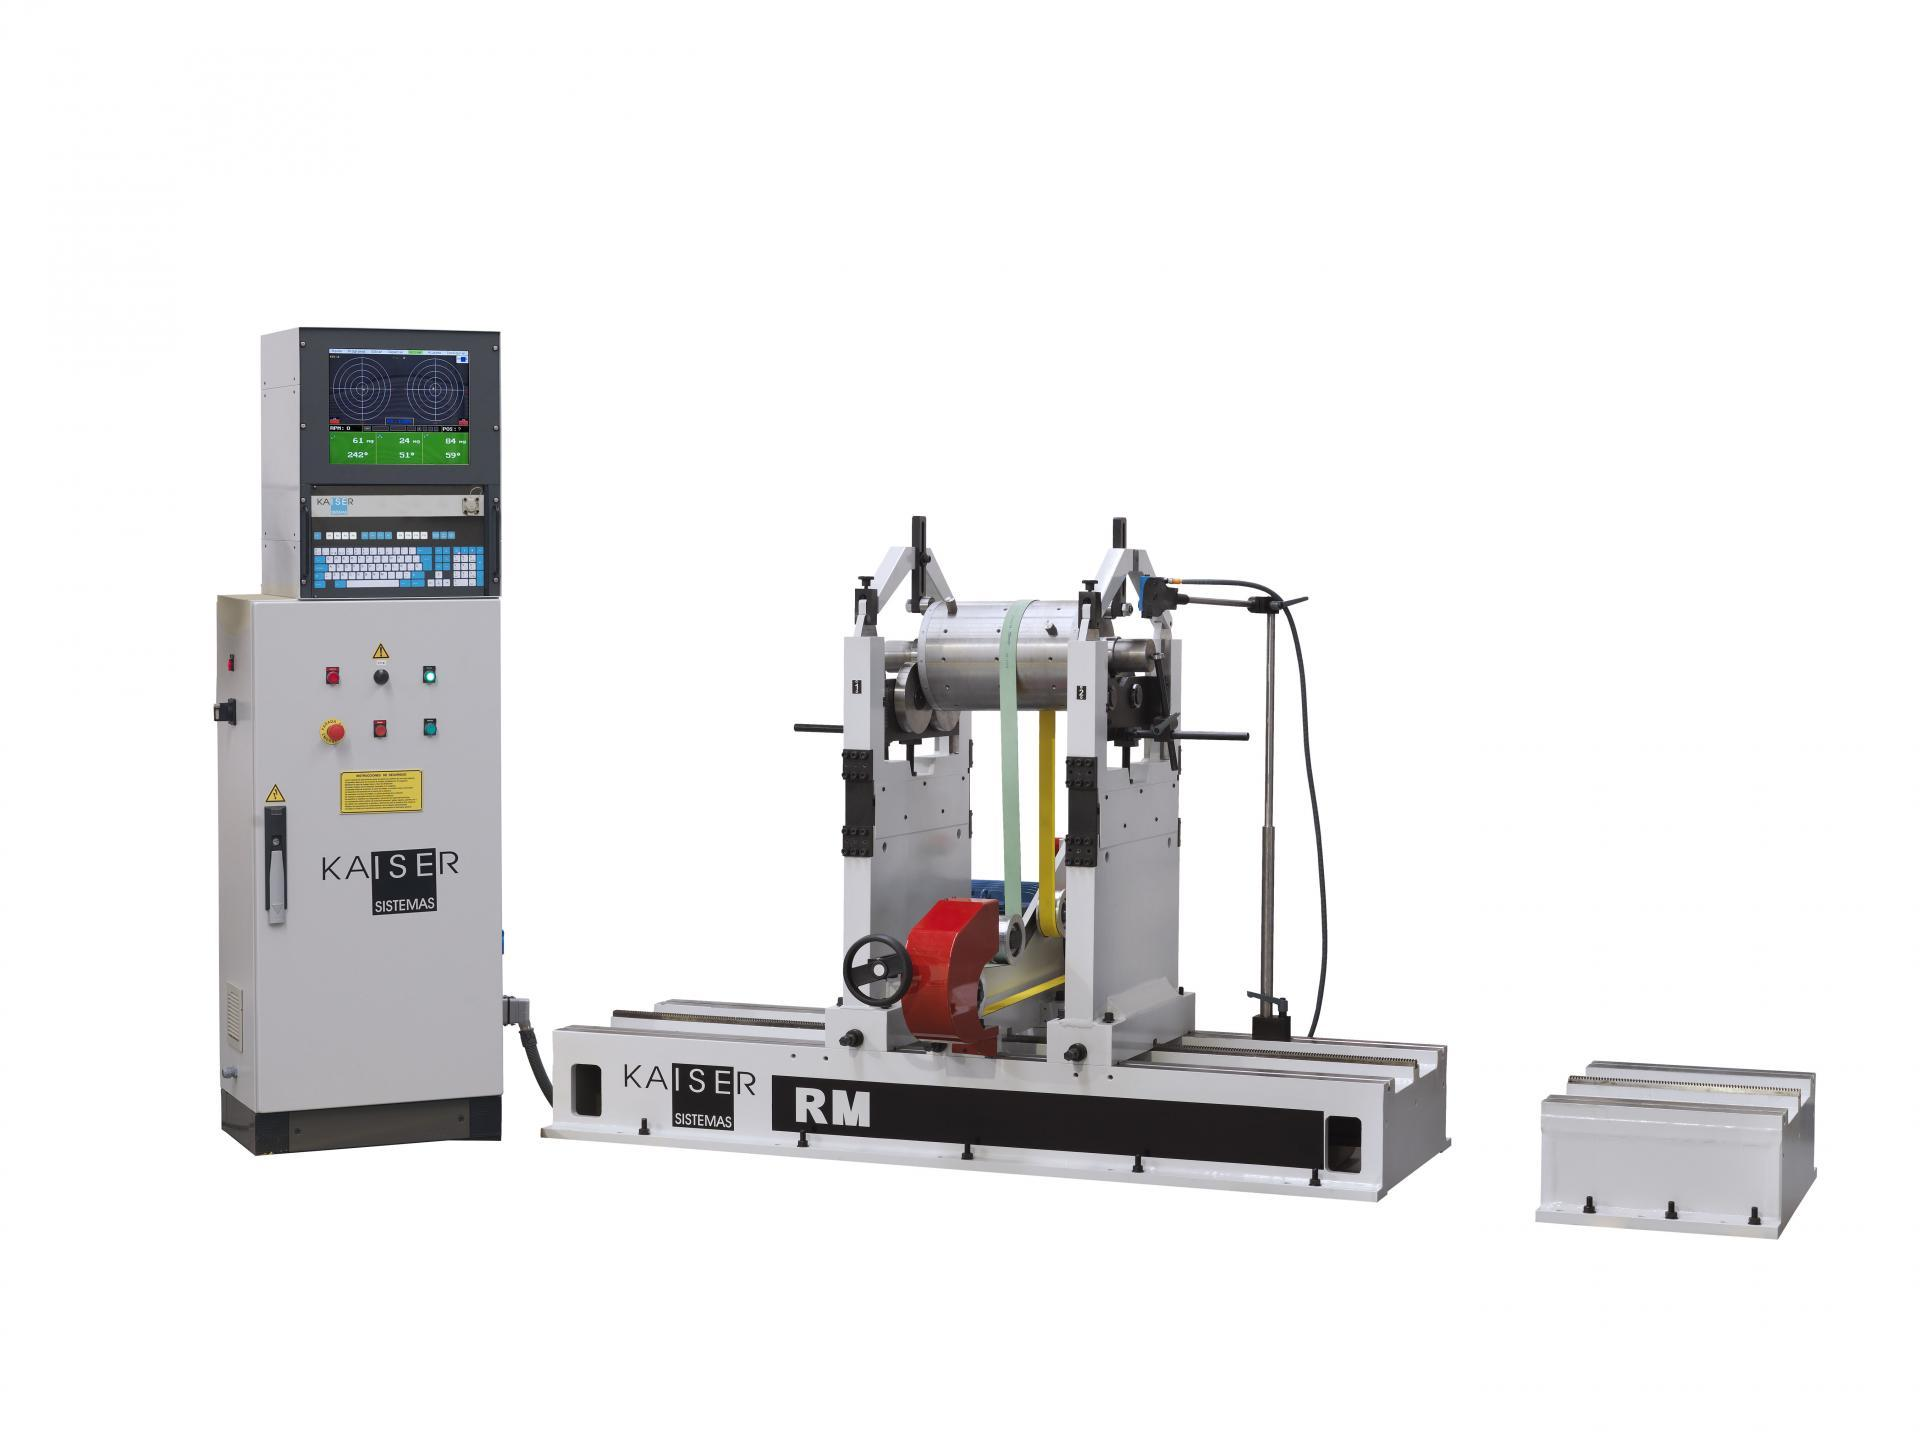 REF 09 - MODEL RM2000.1 HORIZONTAL BALANCING MACHINE